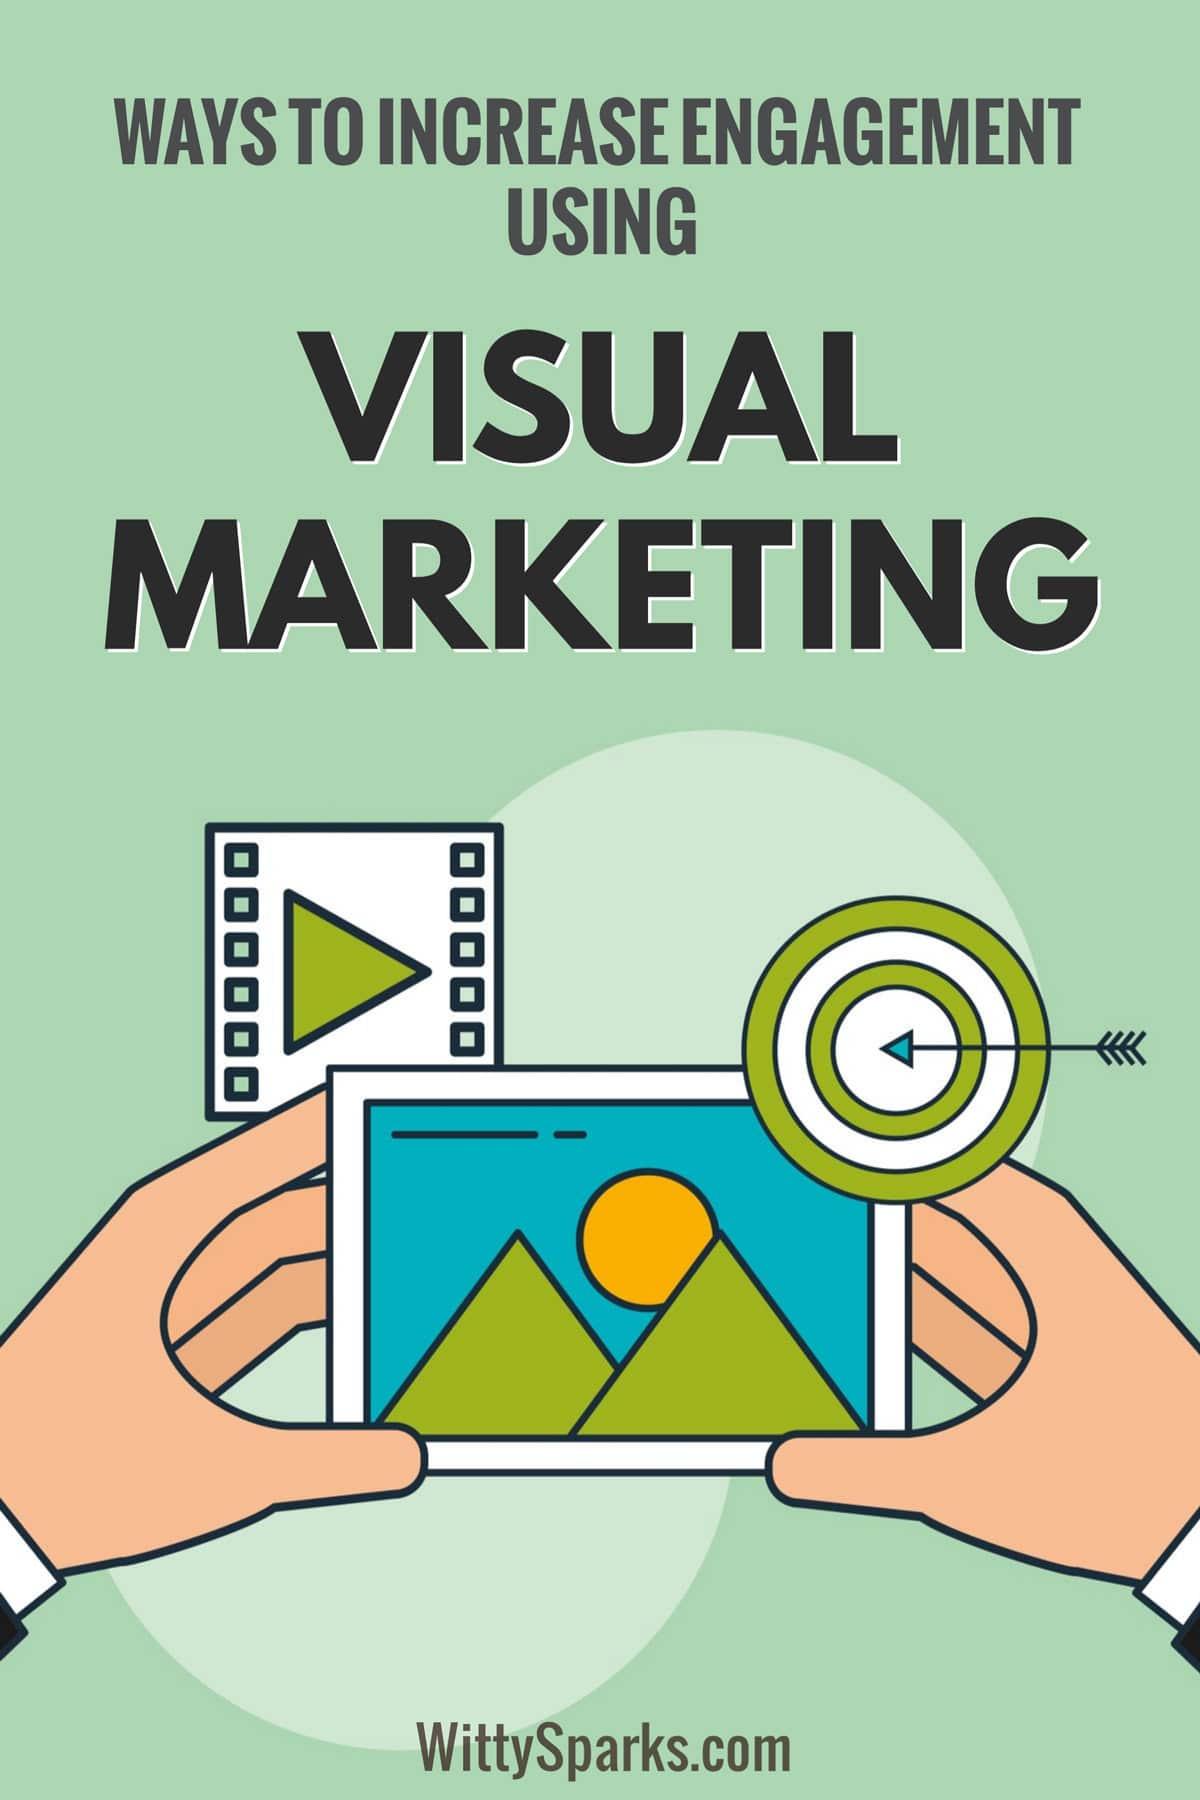 Tips to Increase Engagement Using Visual Marketing